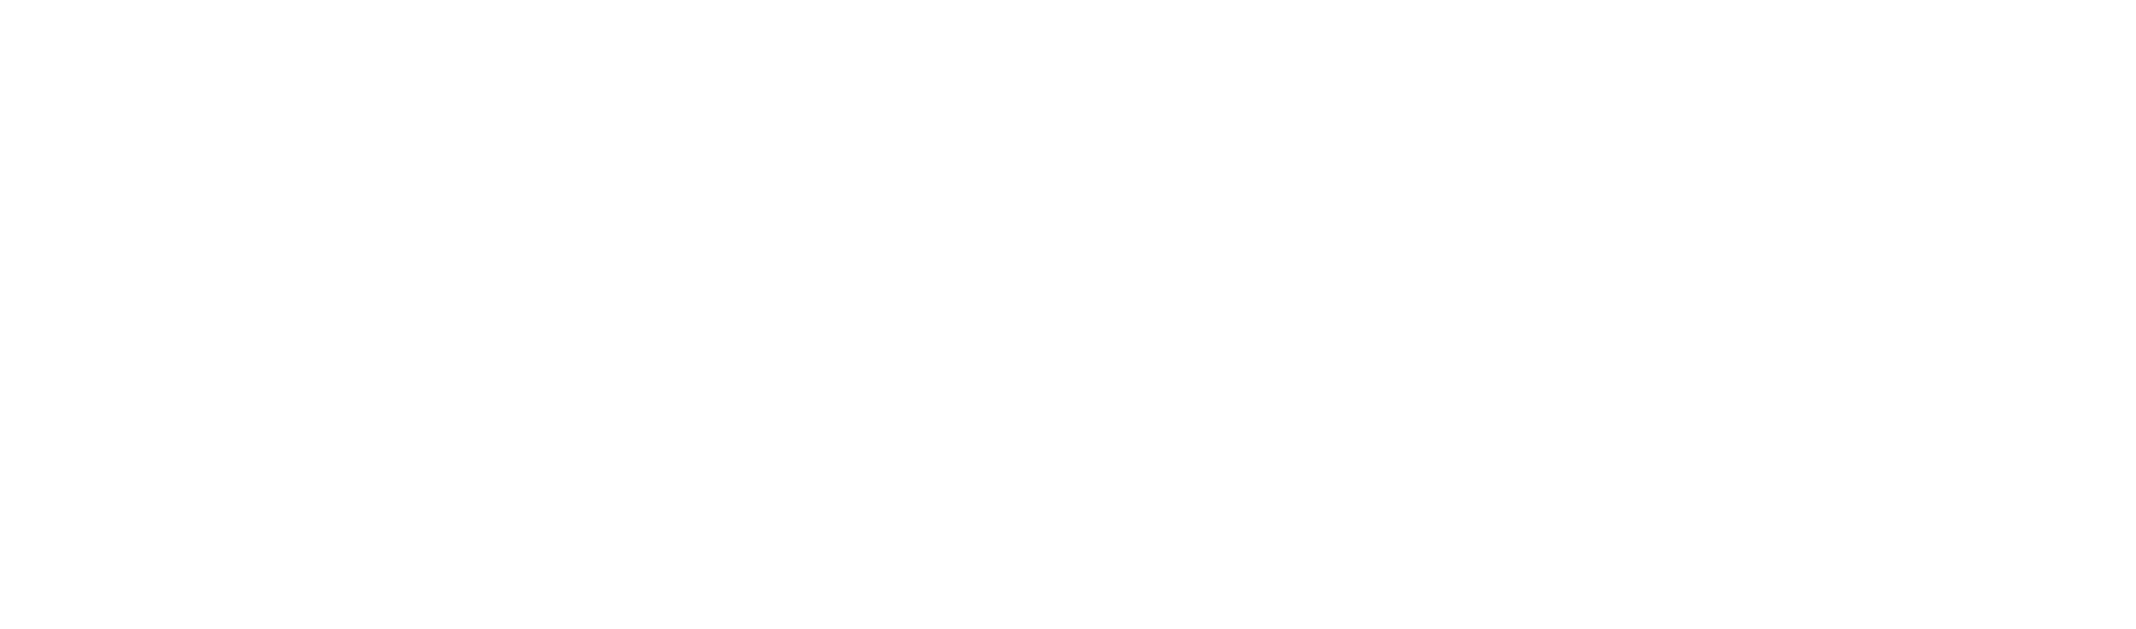 GolfNow VIP Program